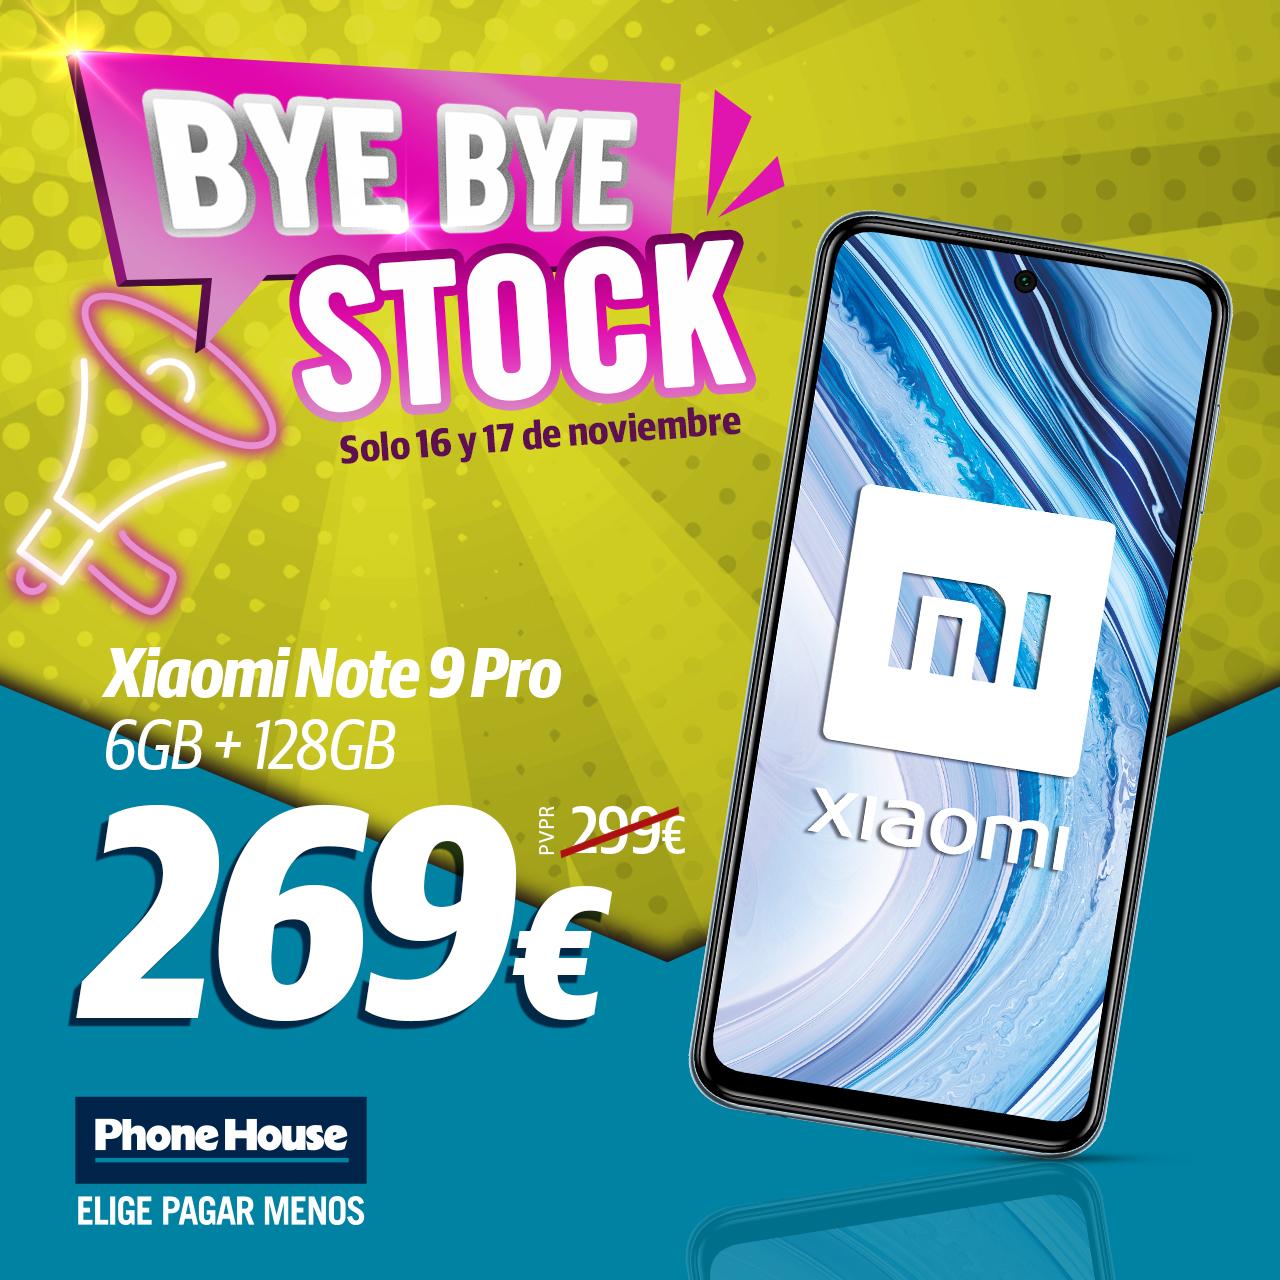 Rrss Bye Stock Prioridad 1 Smartphones